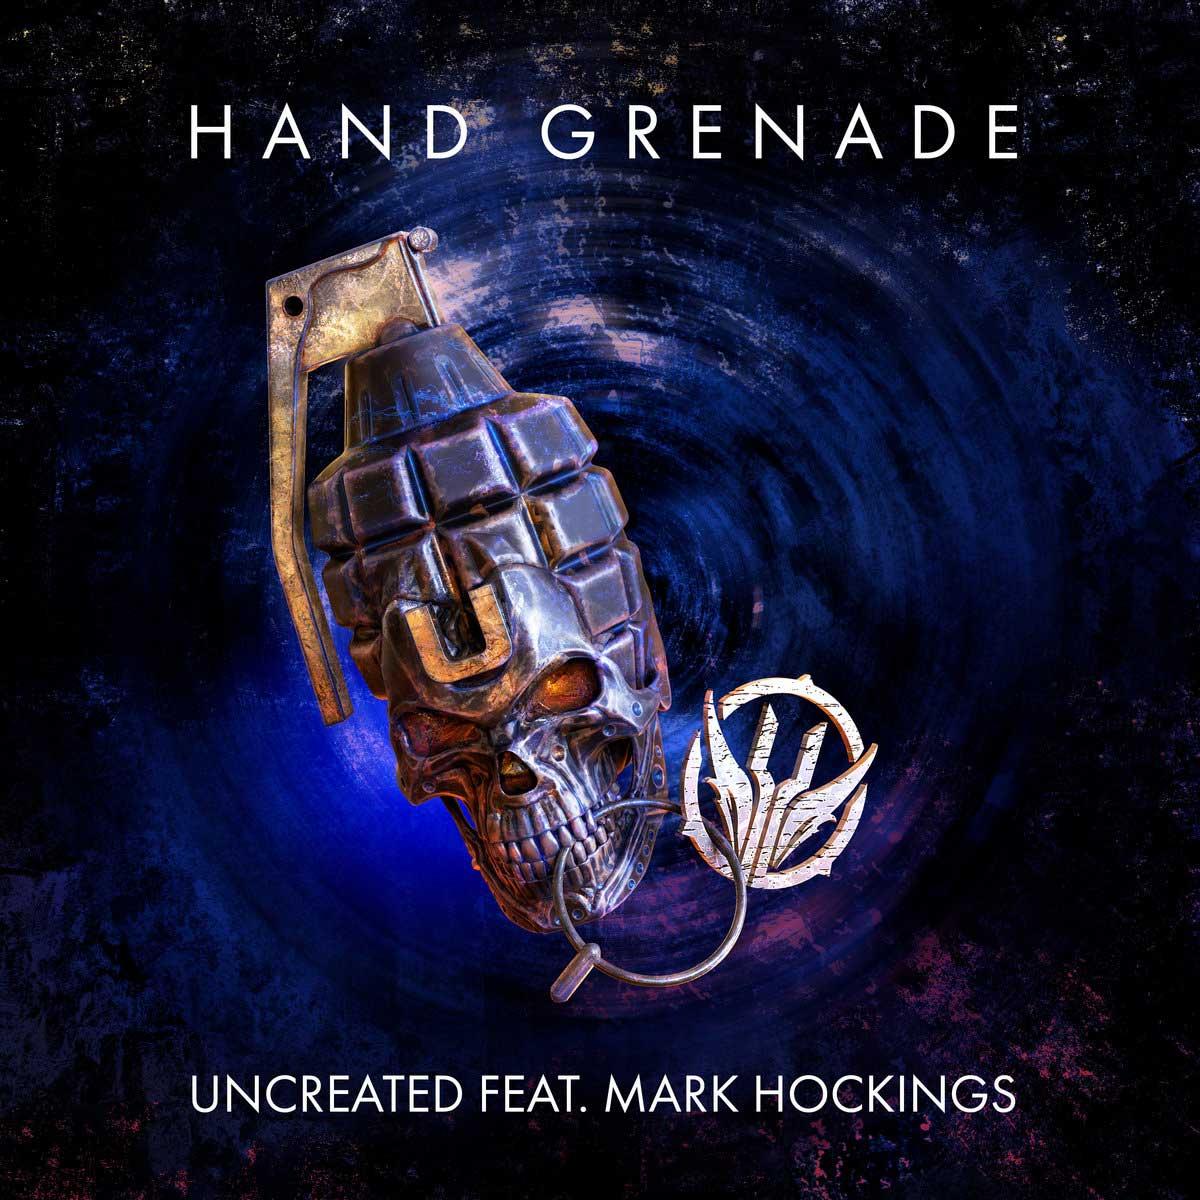 Uncreated - Hand Grenade (feat. Mark Hockings) - Uncreated - Hand Grenade